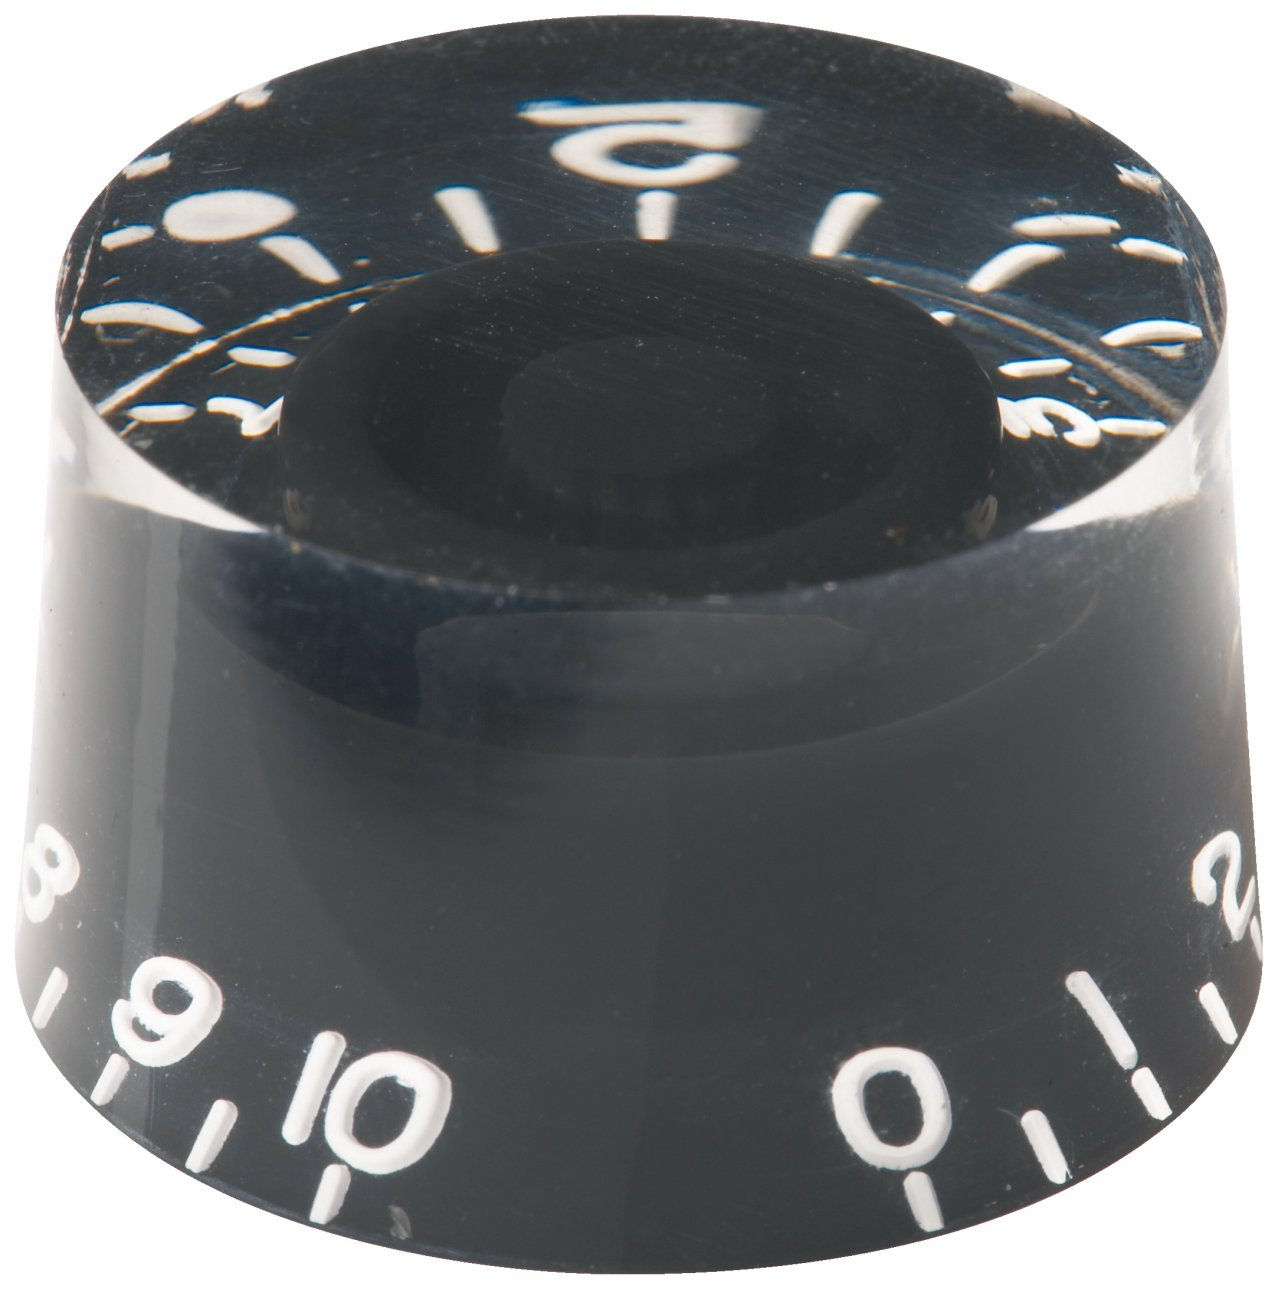 Framus Vintage Parts - Potentiometer Knob Set for Jan Akkerman & Nashville Models - Black, 2 pcs.